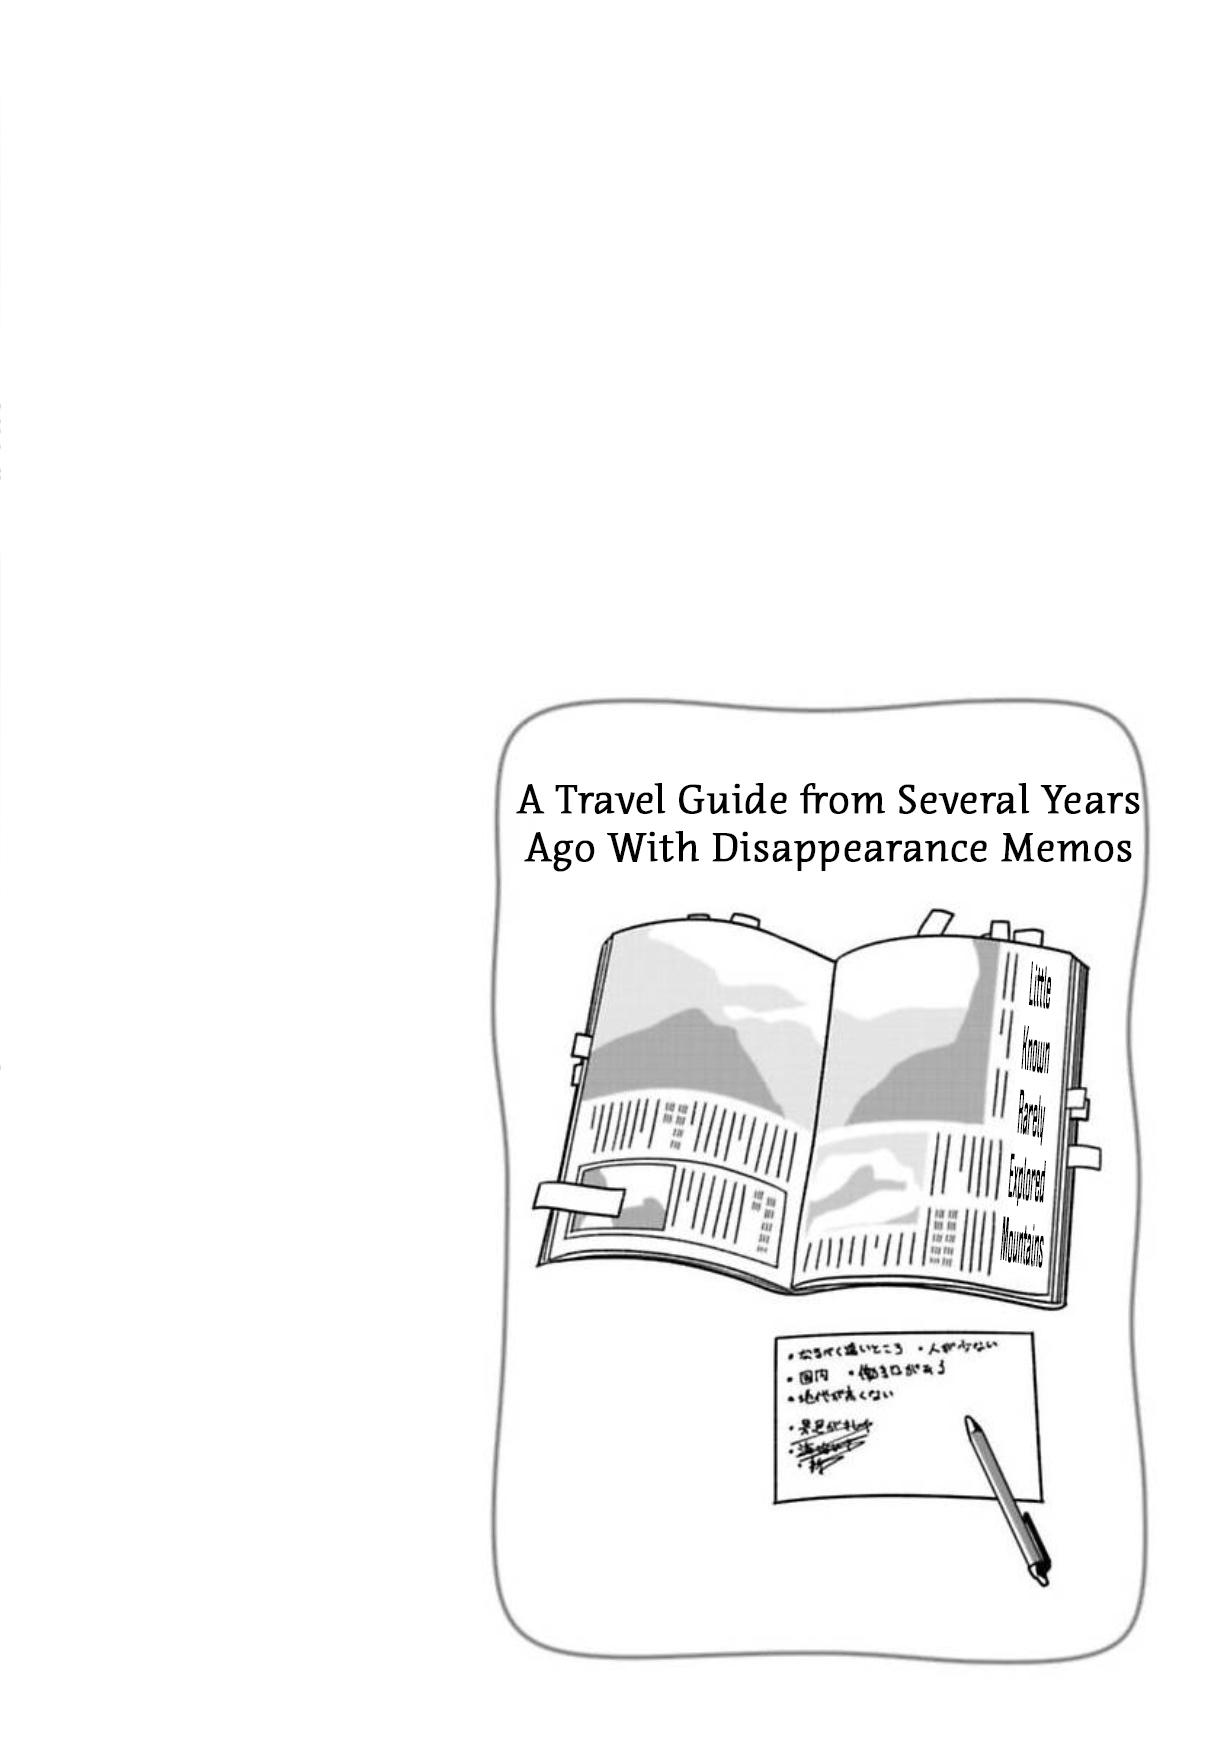 https://img2.nineanime.com/comics/pic4/50/39410/1776473/5a0ff4520c5b59aae5315322f3927d39.jpg Page 1